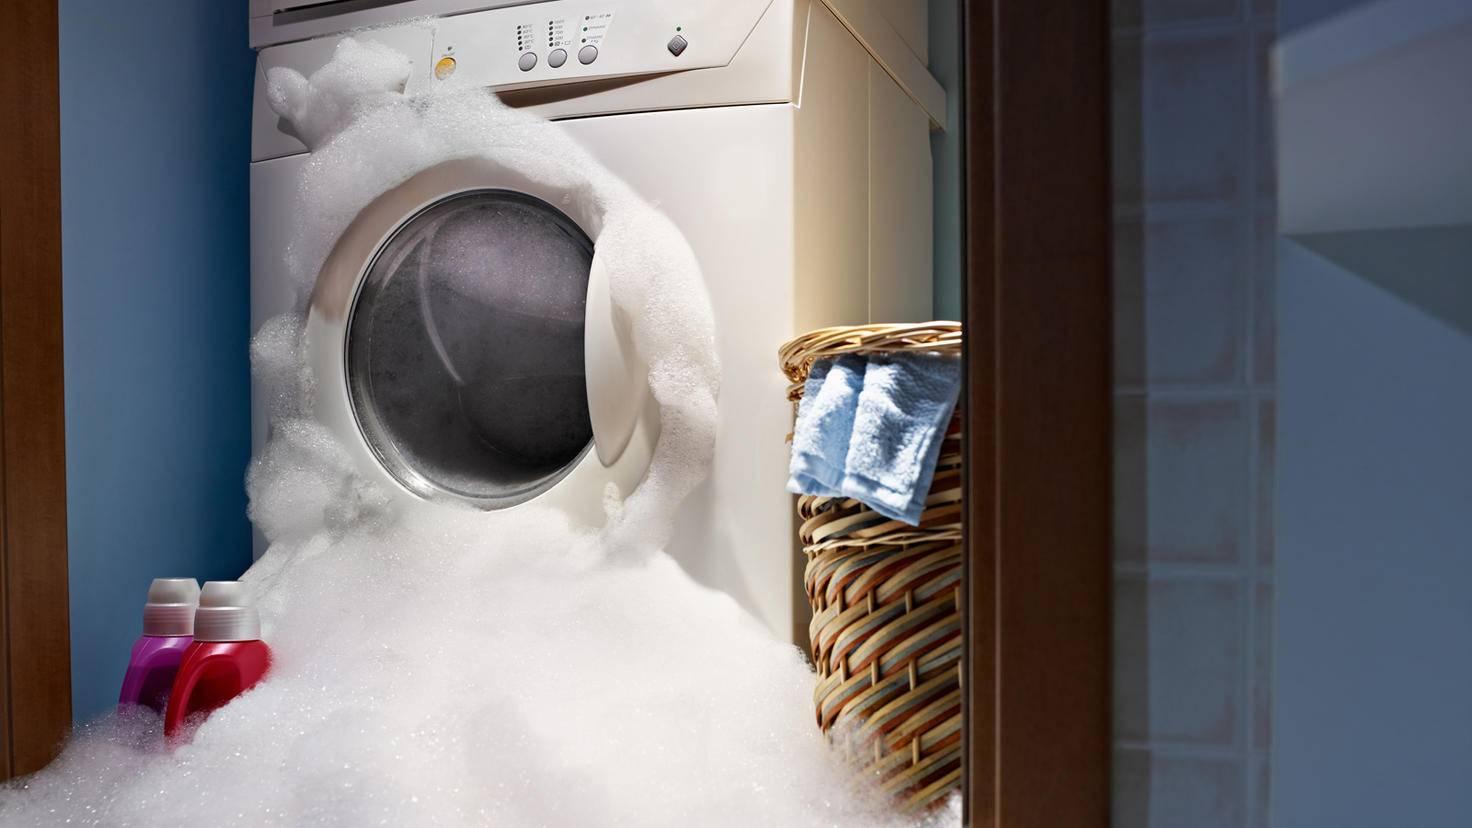 Waschmaschine-diego_cervo-ThinkstockPhotos-136628195